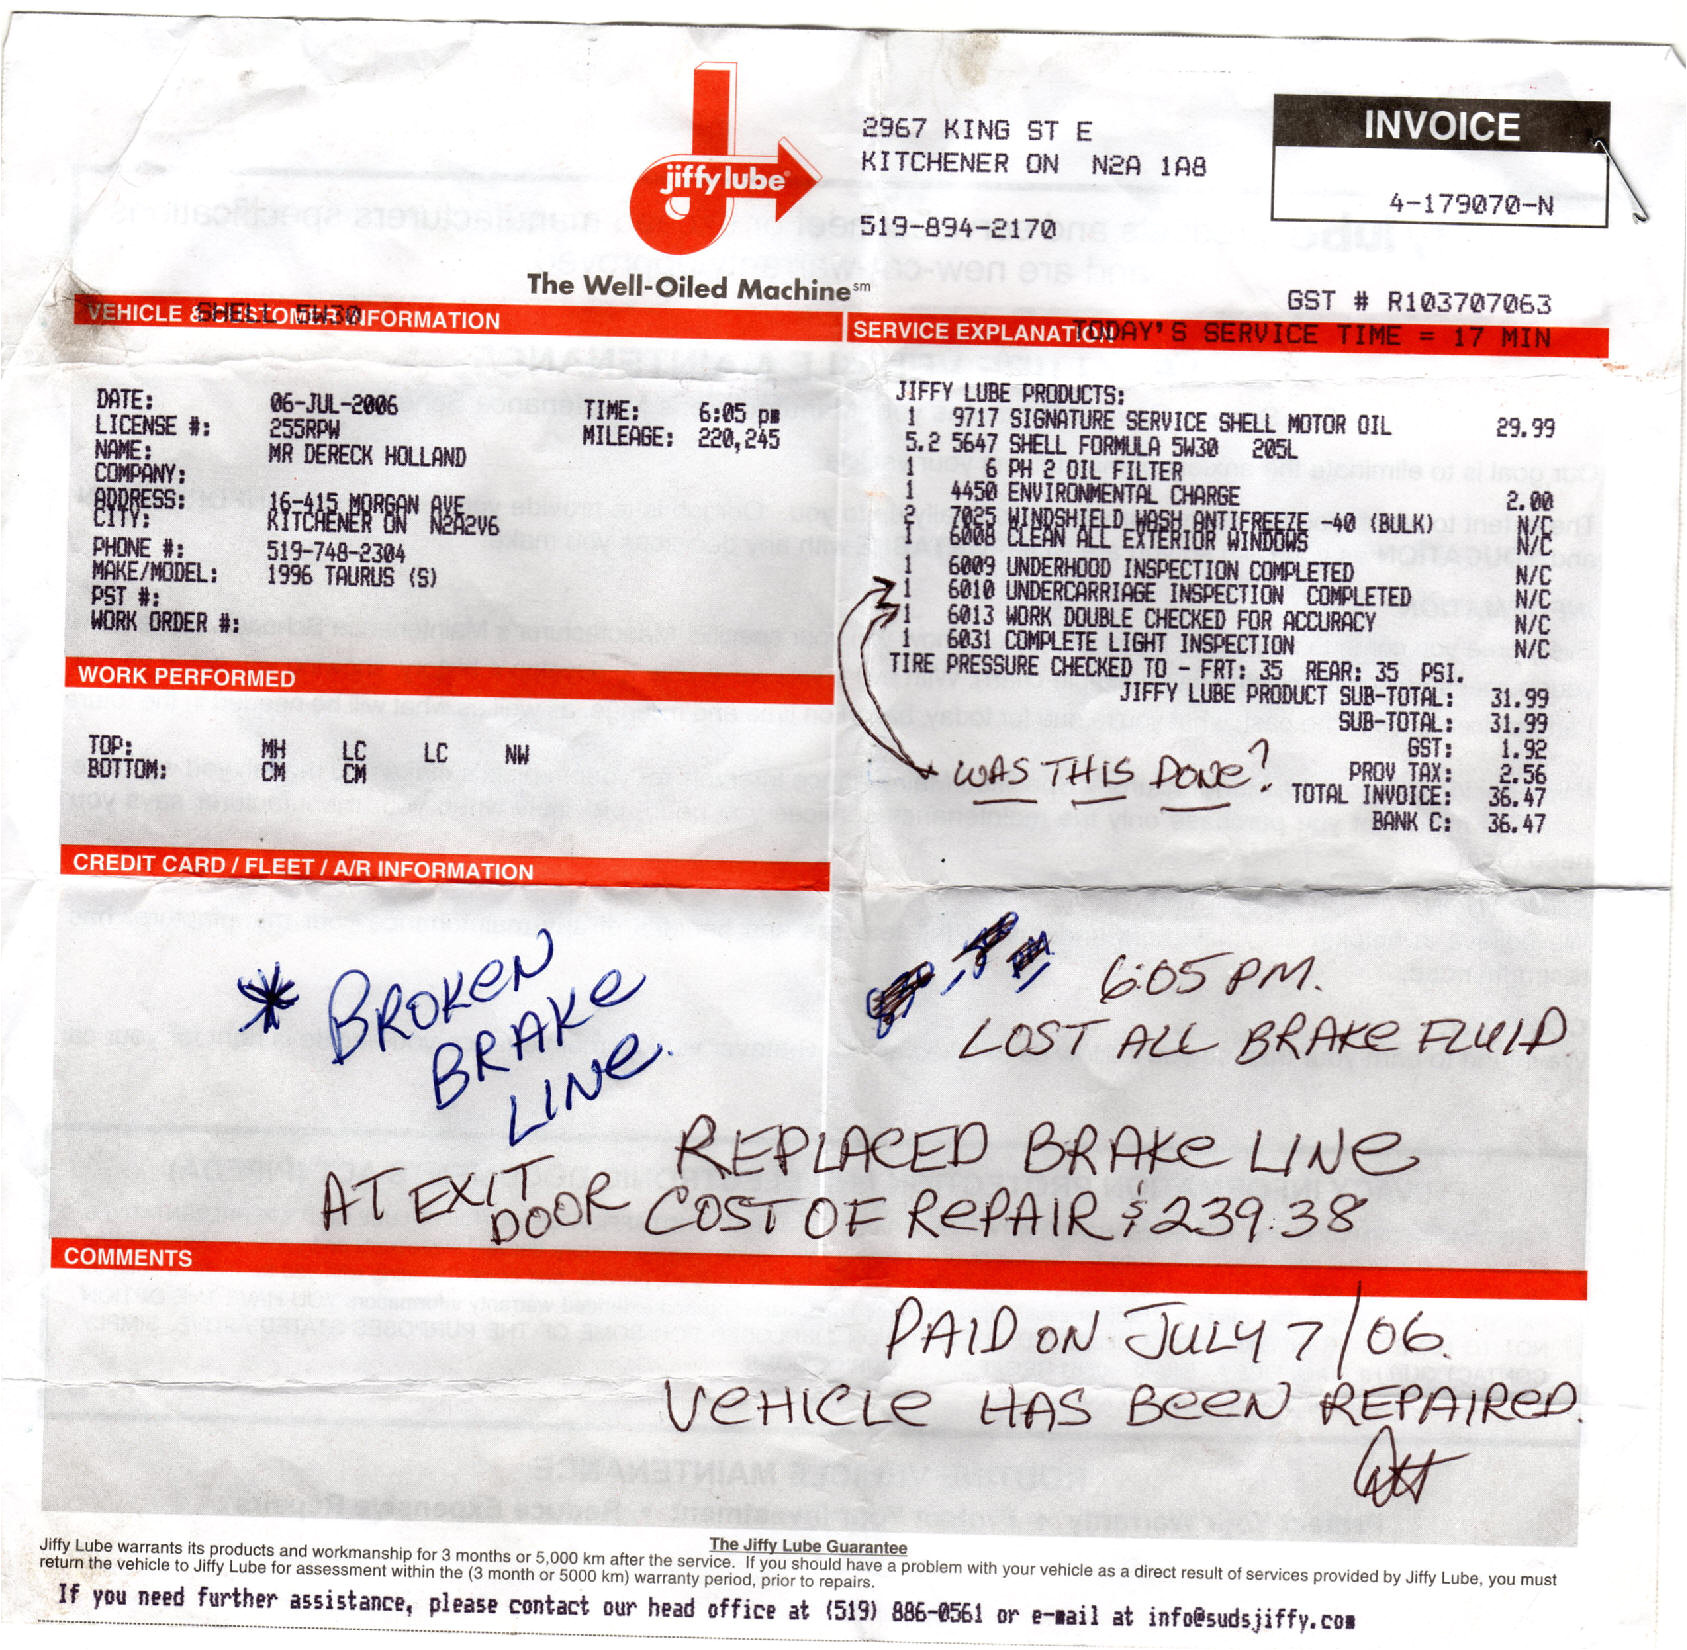 Jiffy Lube Receipt Template Expressexpense Custom Receipt Maker Online Receipt